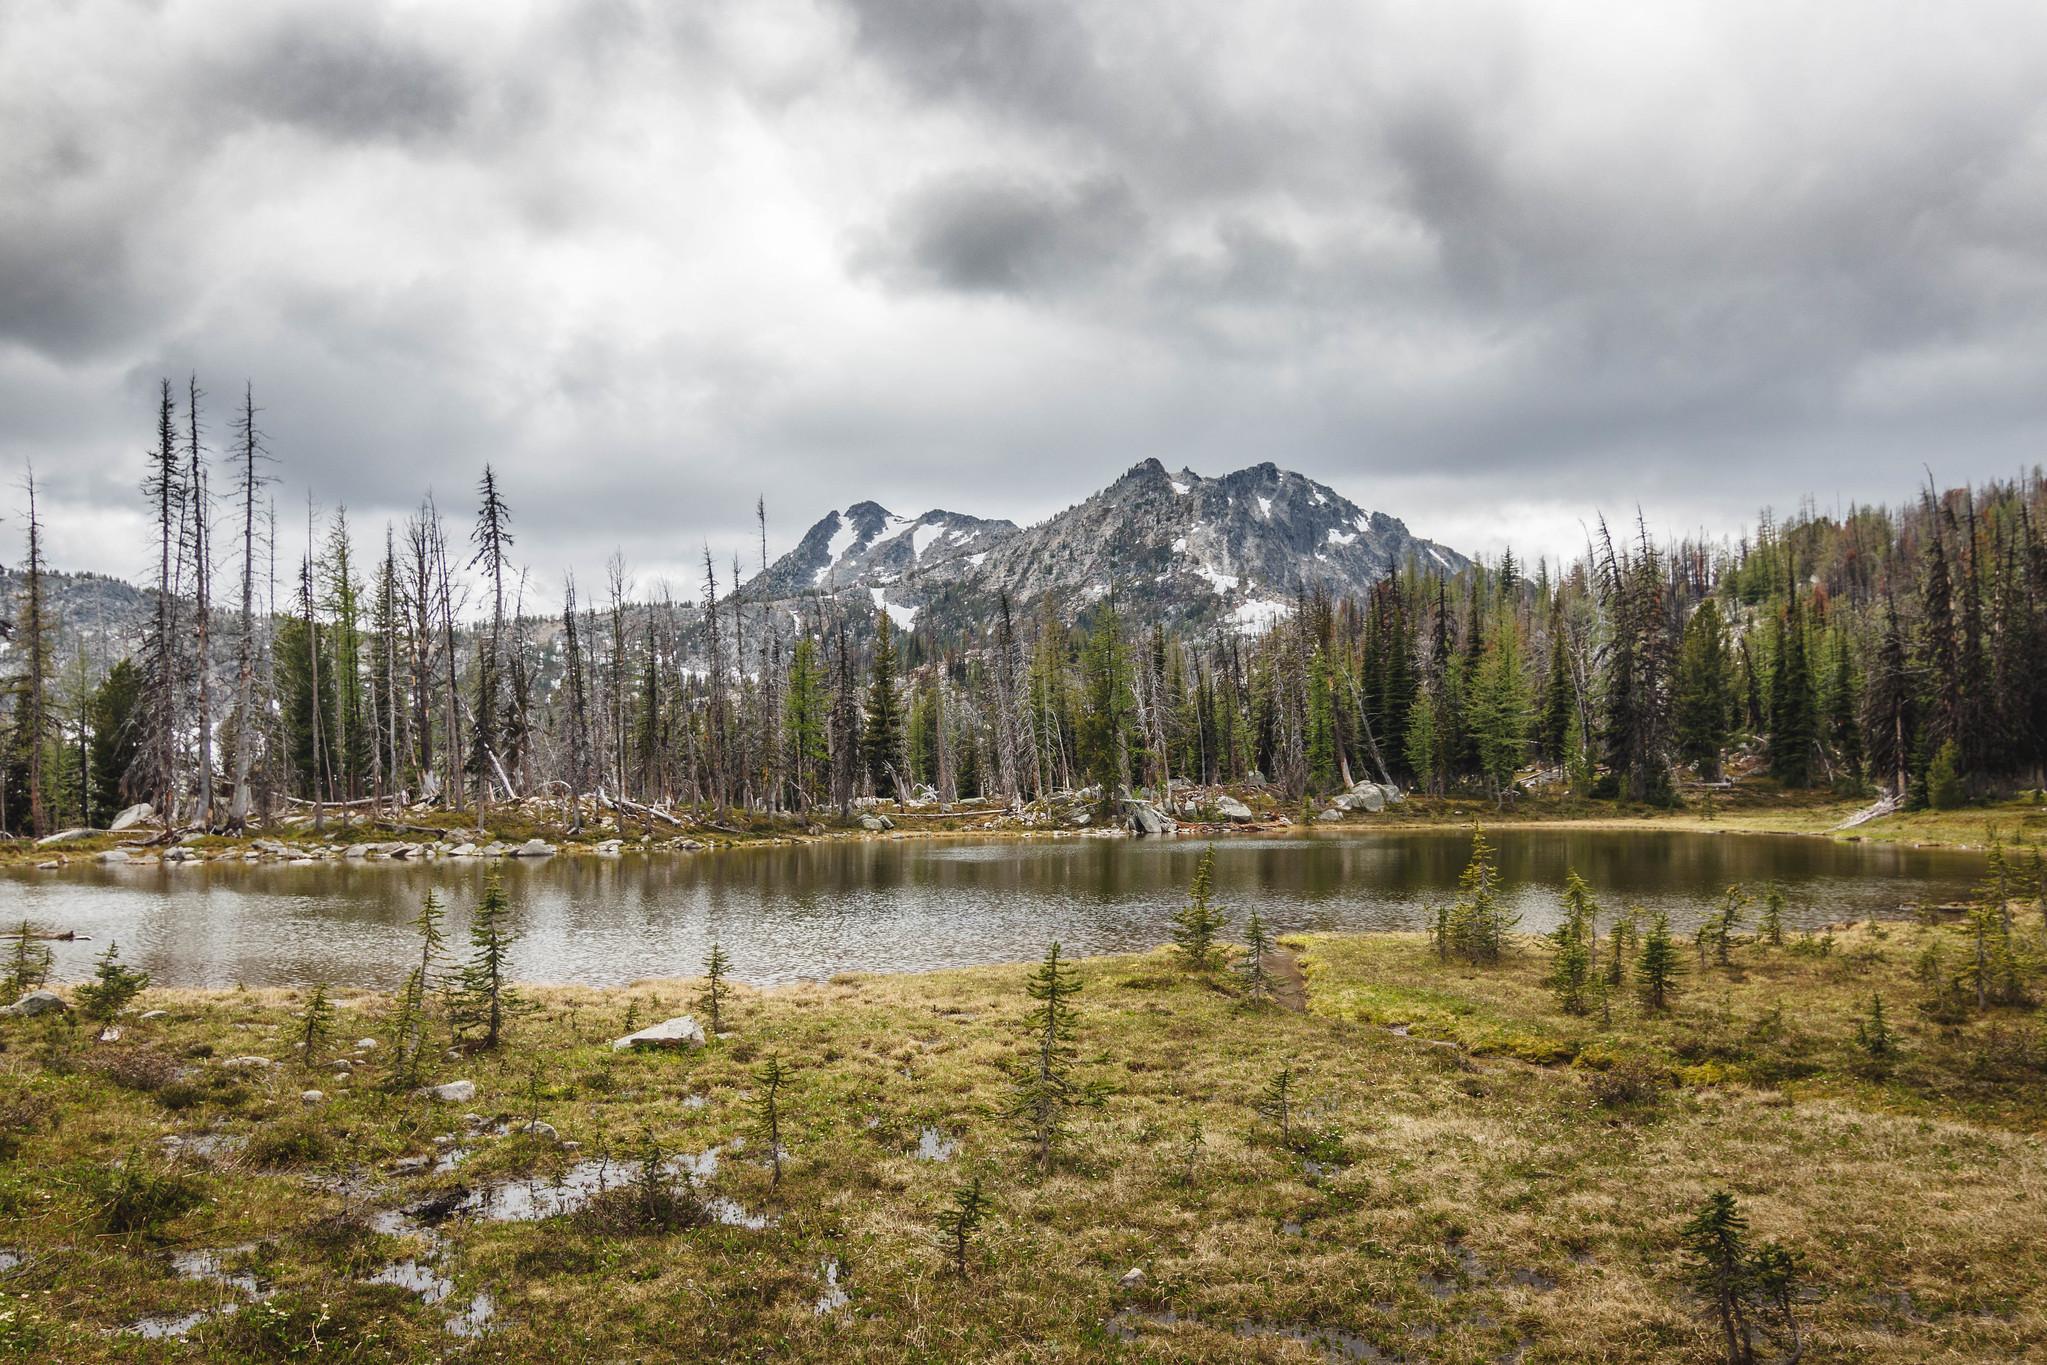 Rock Lake backed by Peepsight Mountain